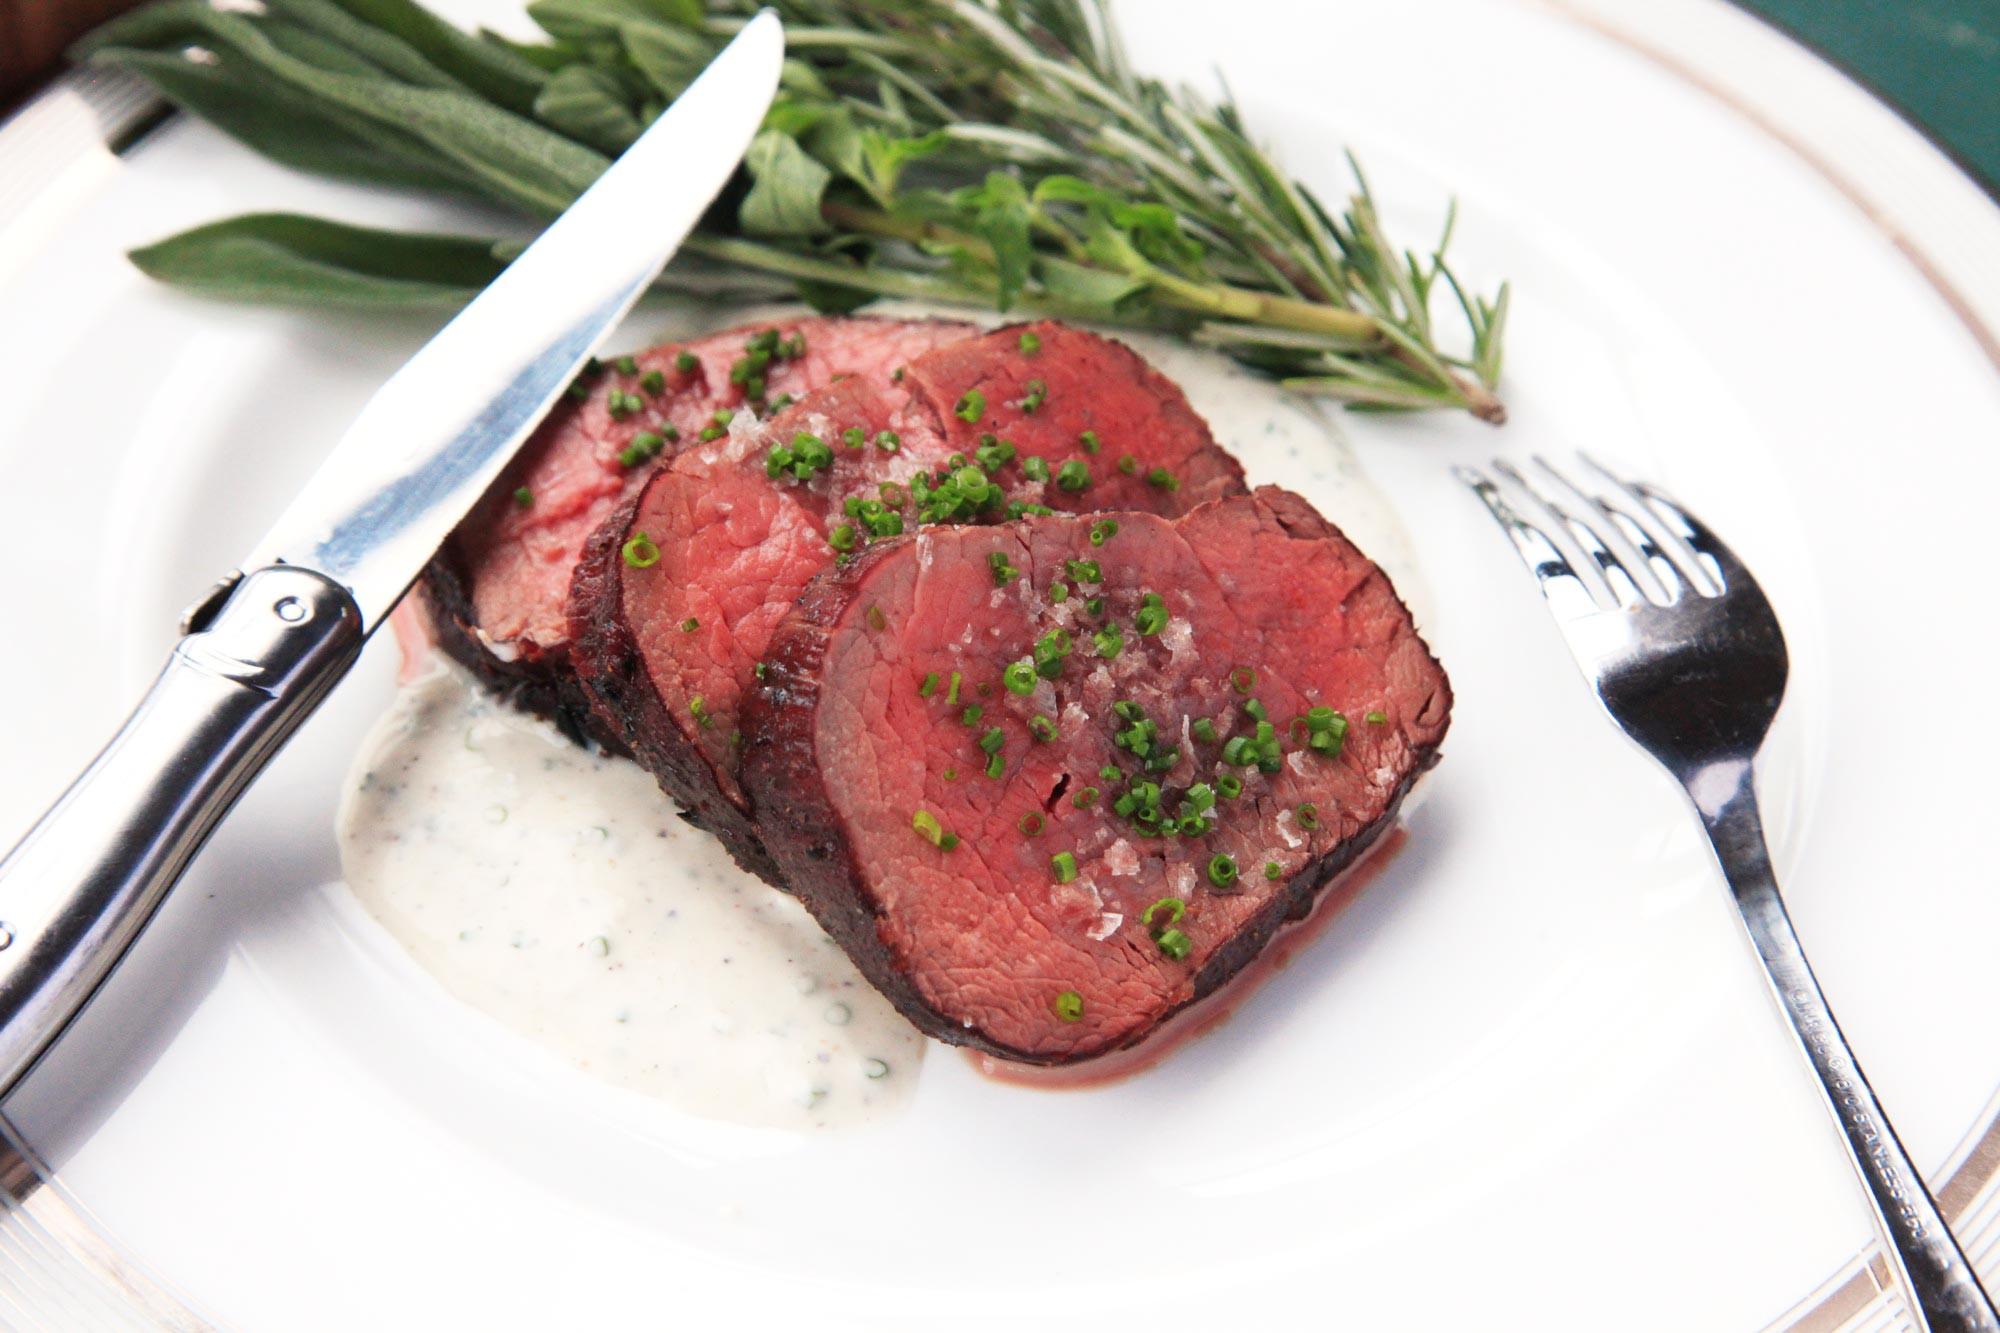 Beef Tenderloin Recipes  The Food Lab The Secret to Perfect Beef Tenderloin The